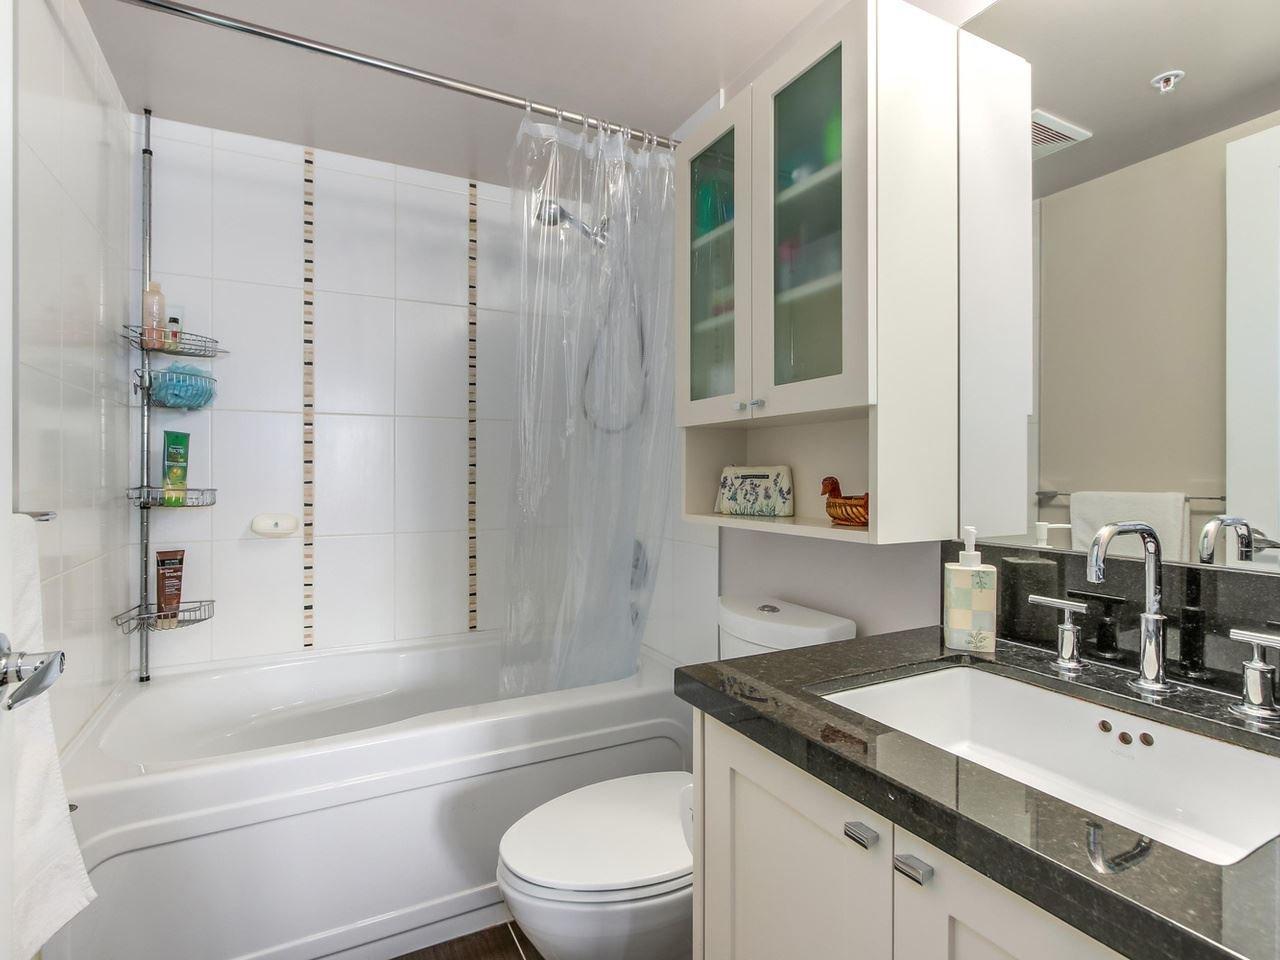 "Photo 12: Photos: 304 405 SKEENA Street in Vancouver: Renfrew VE Condo for sale in ""THE JASMINE"" (Vancouver East)  : MLS®# R2150679"